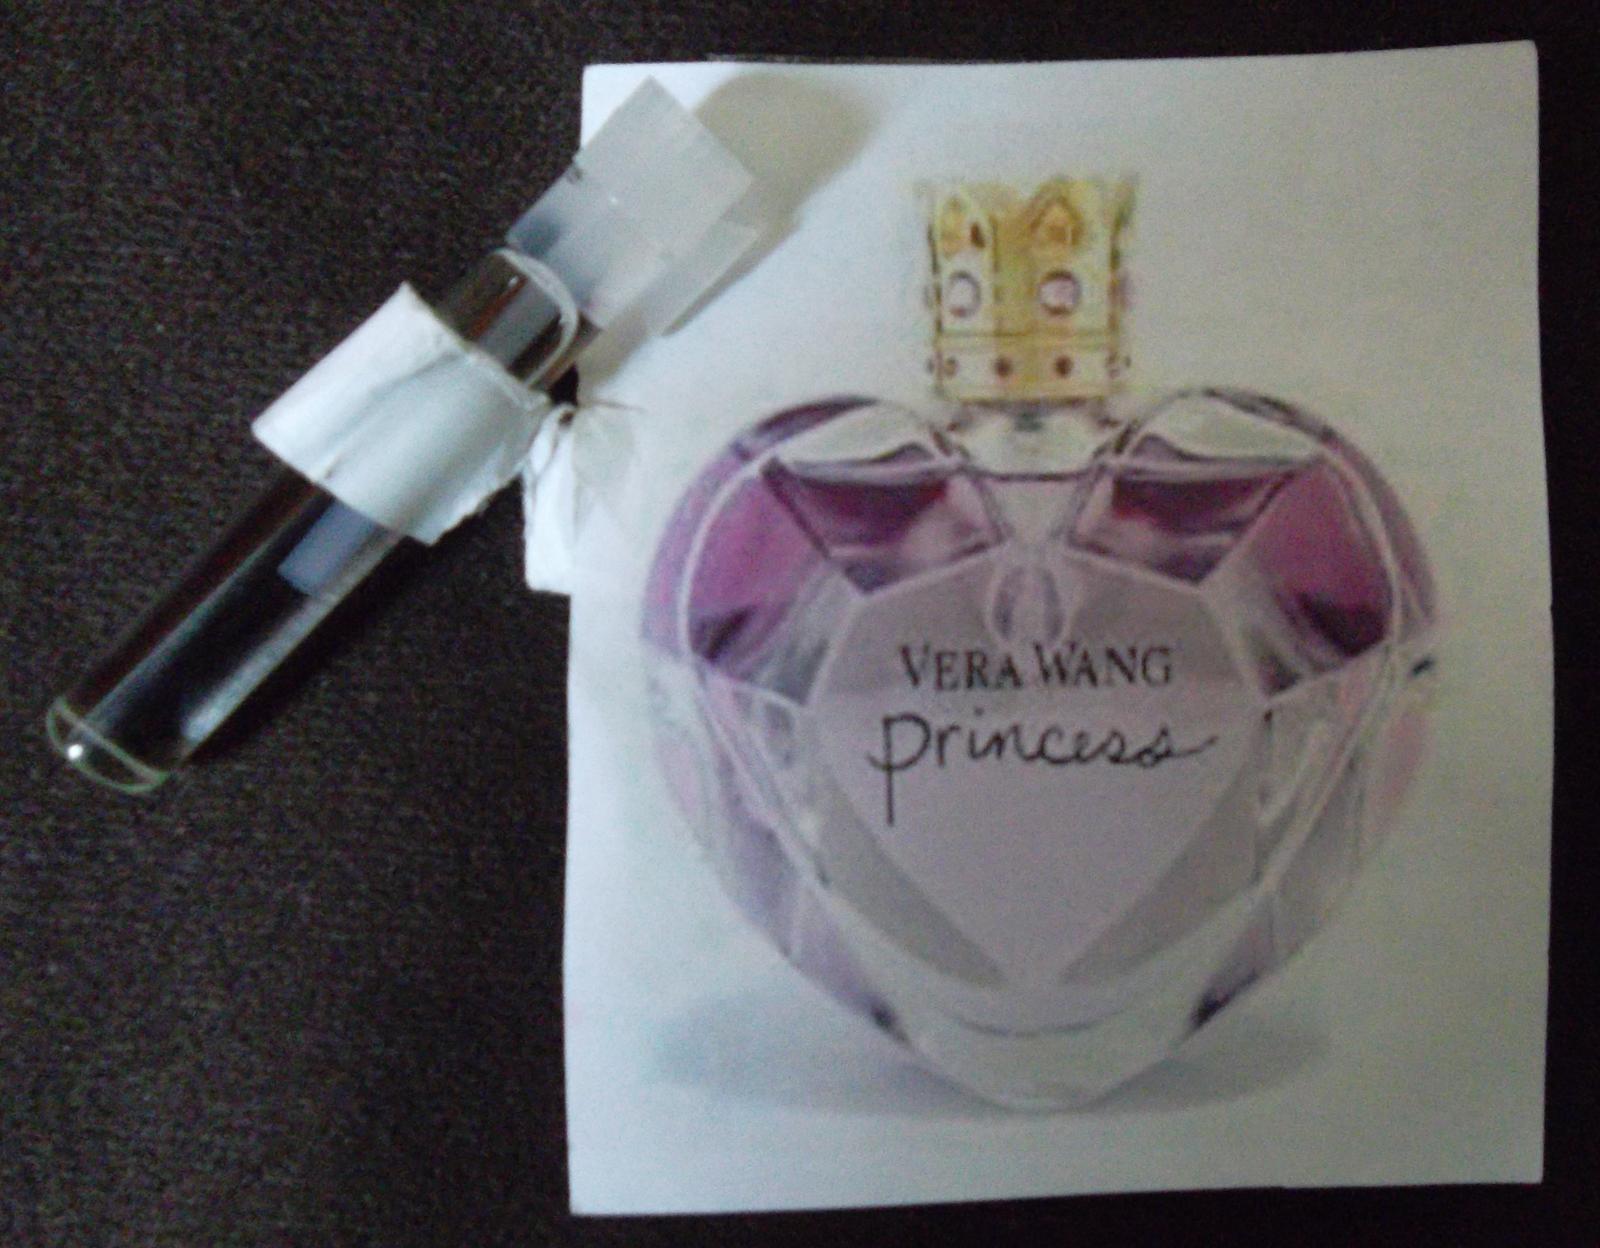 Vzorek Vera Wang Princess - Obrázek č. 1